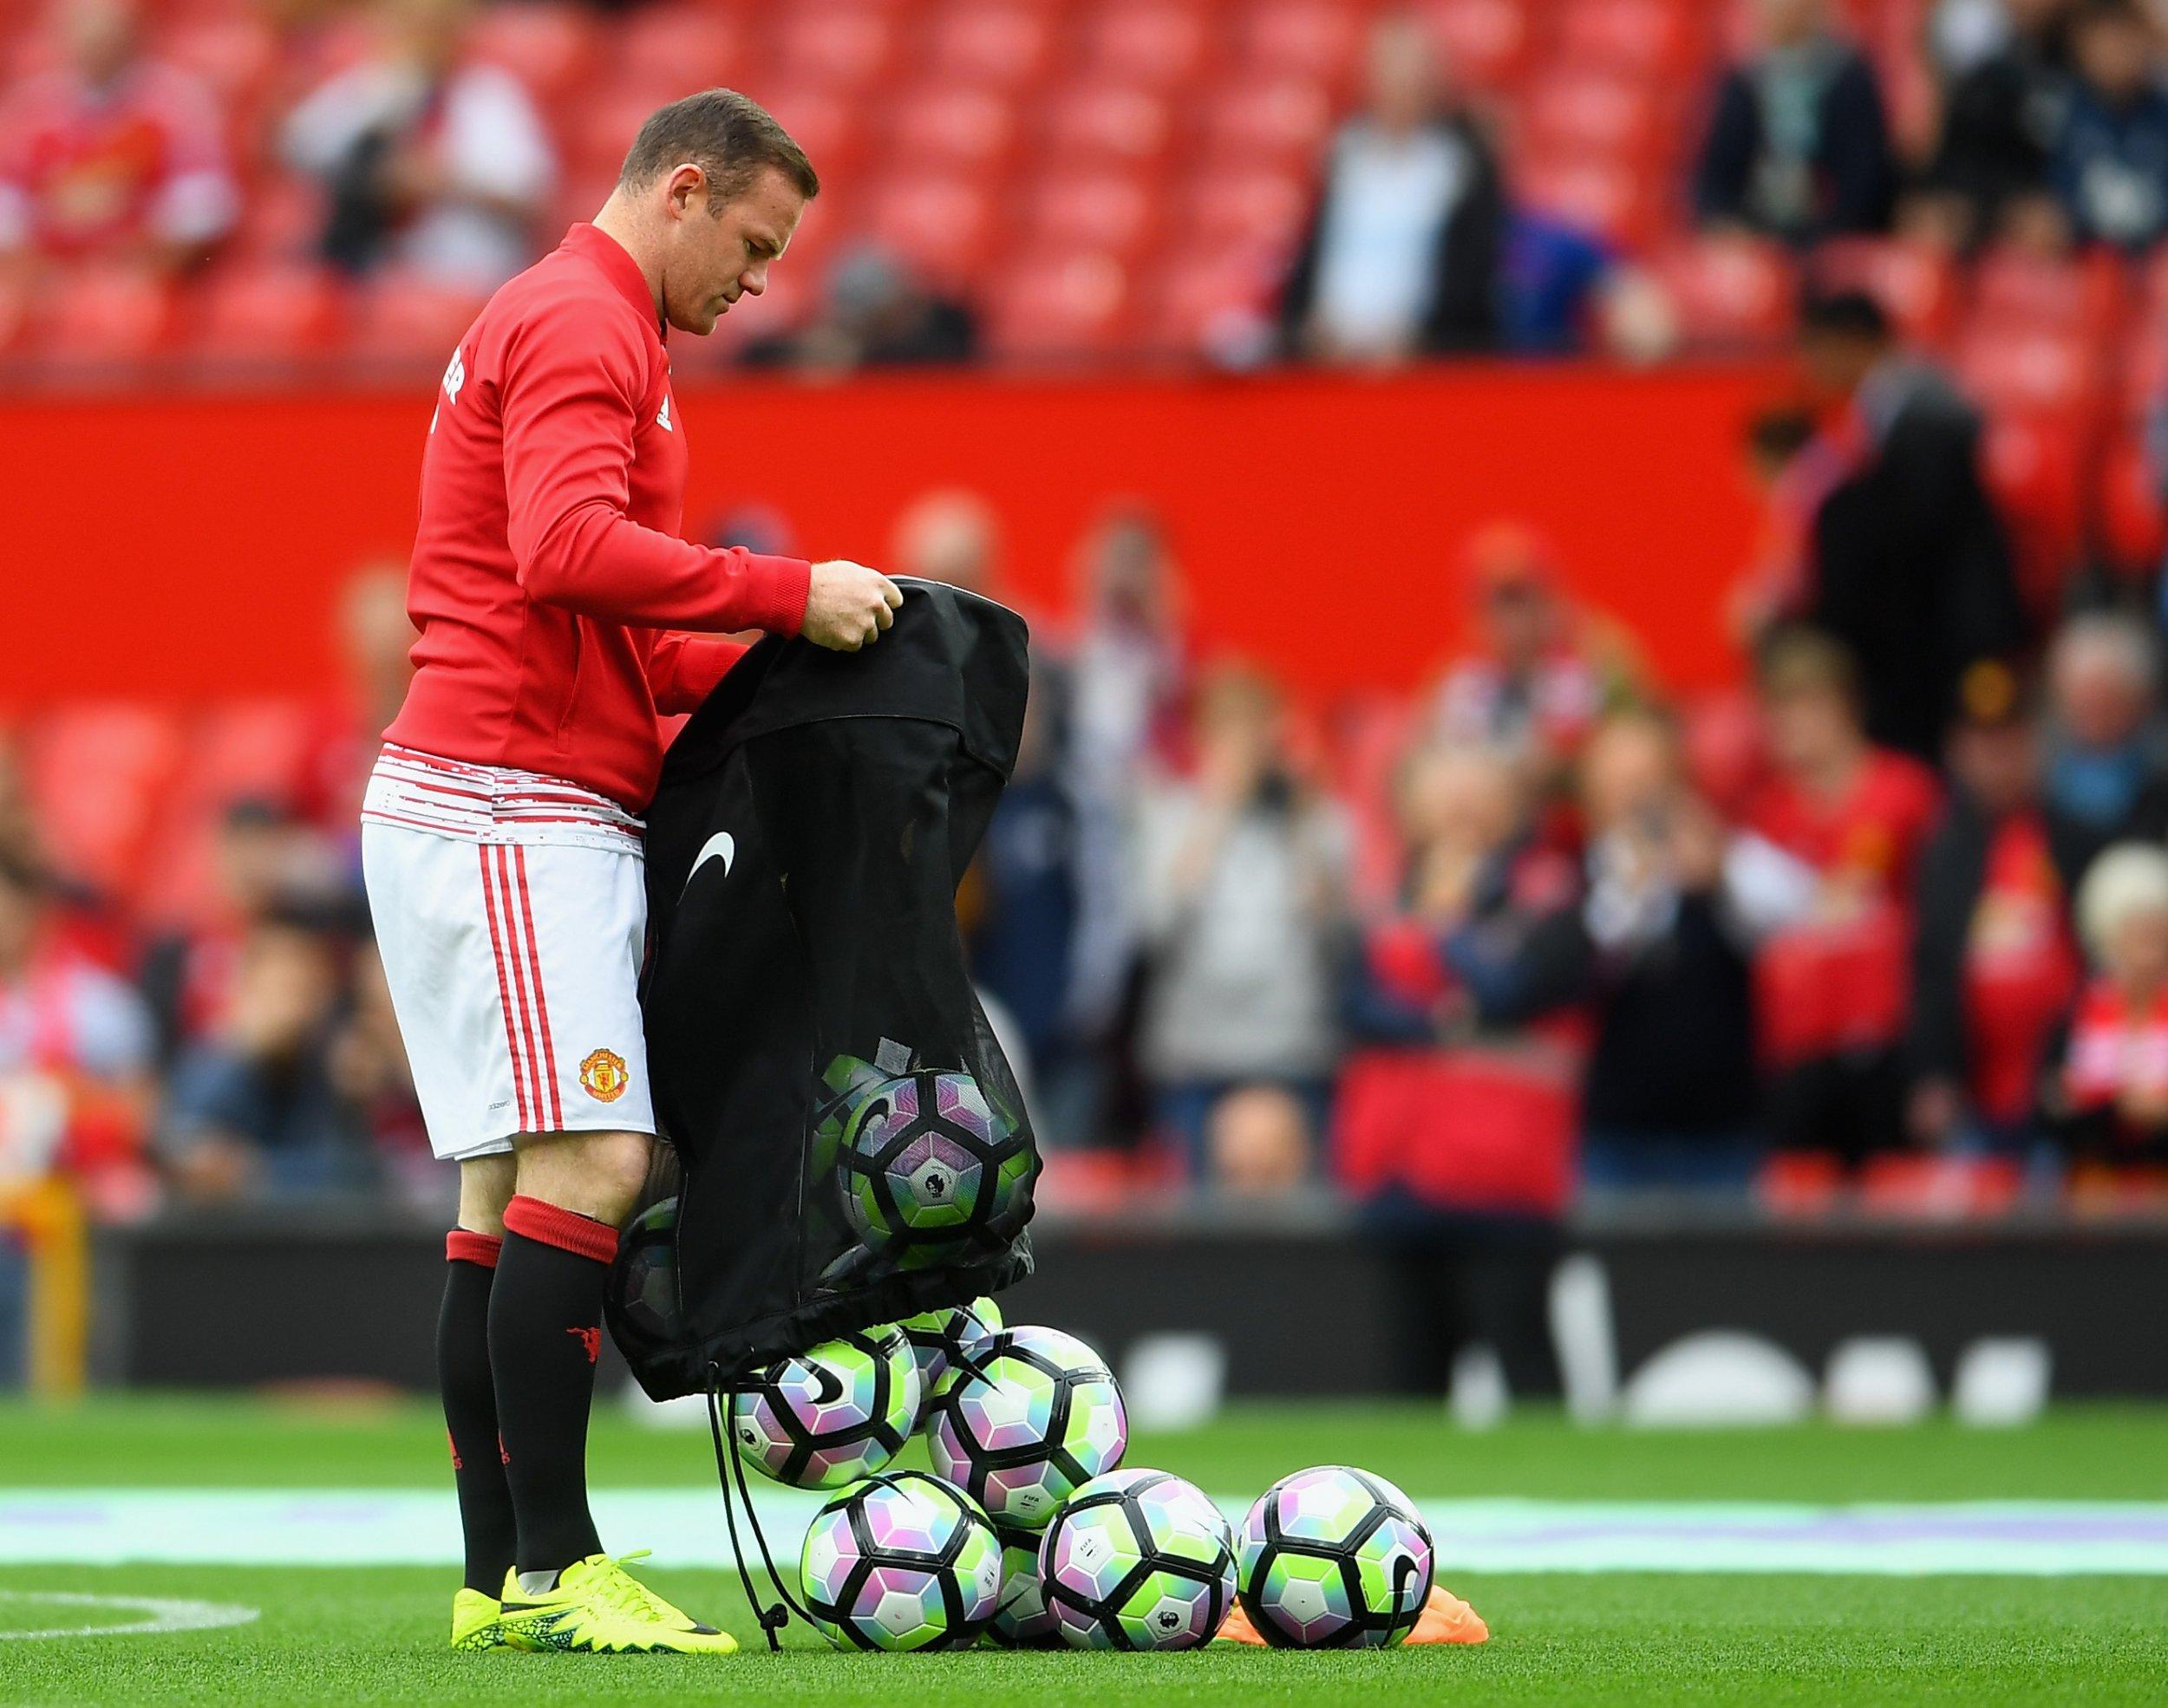 Manchester United club captain Wayne Rooney